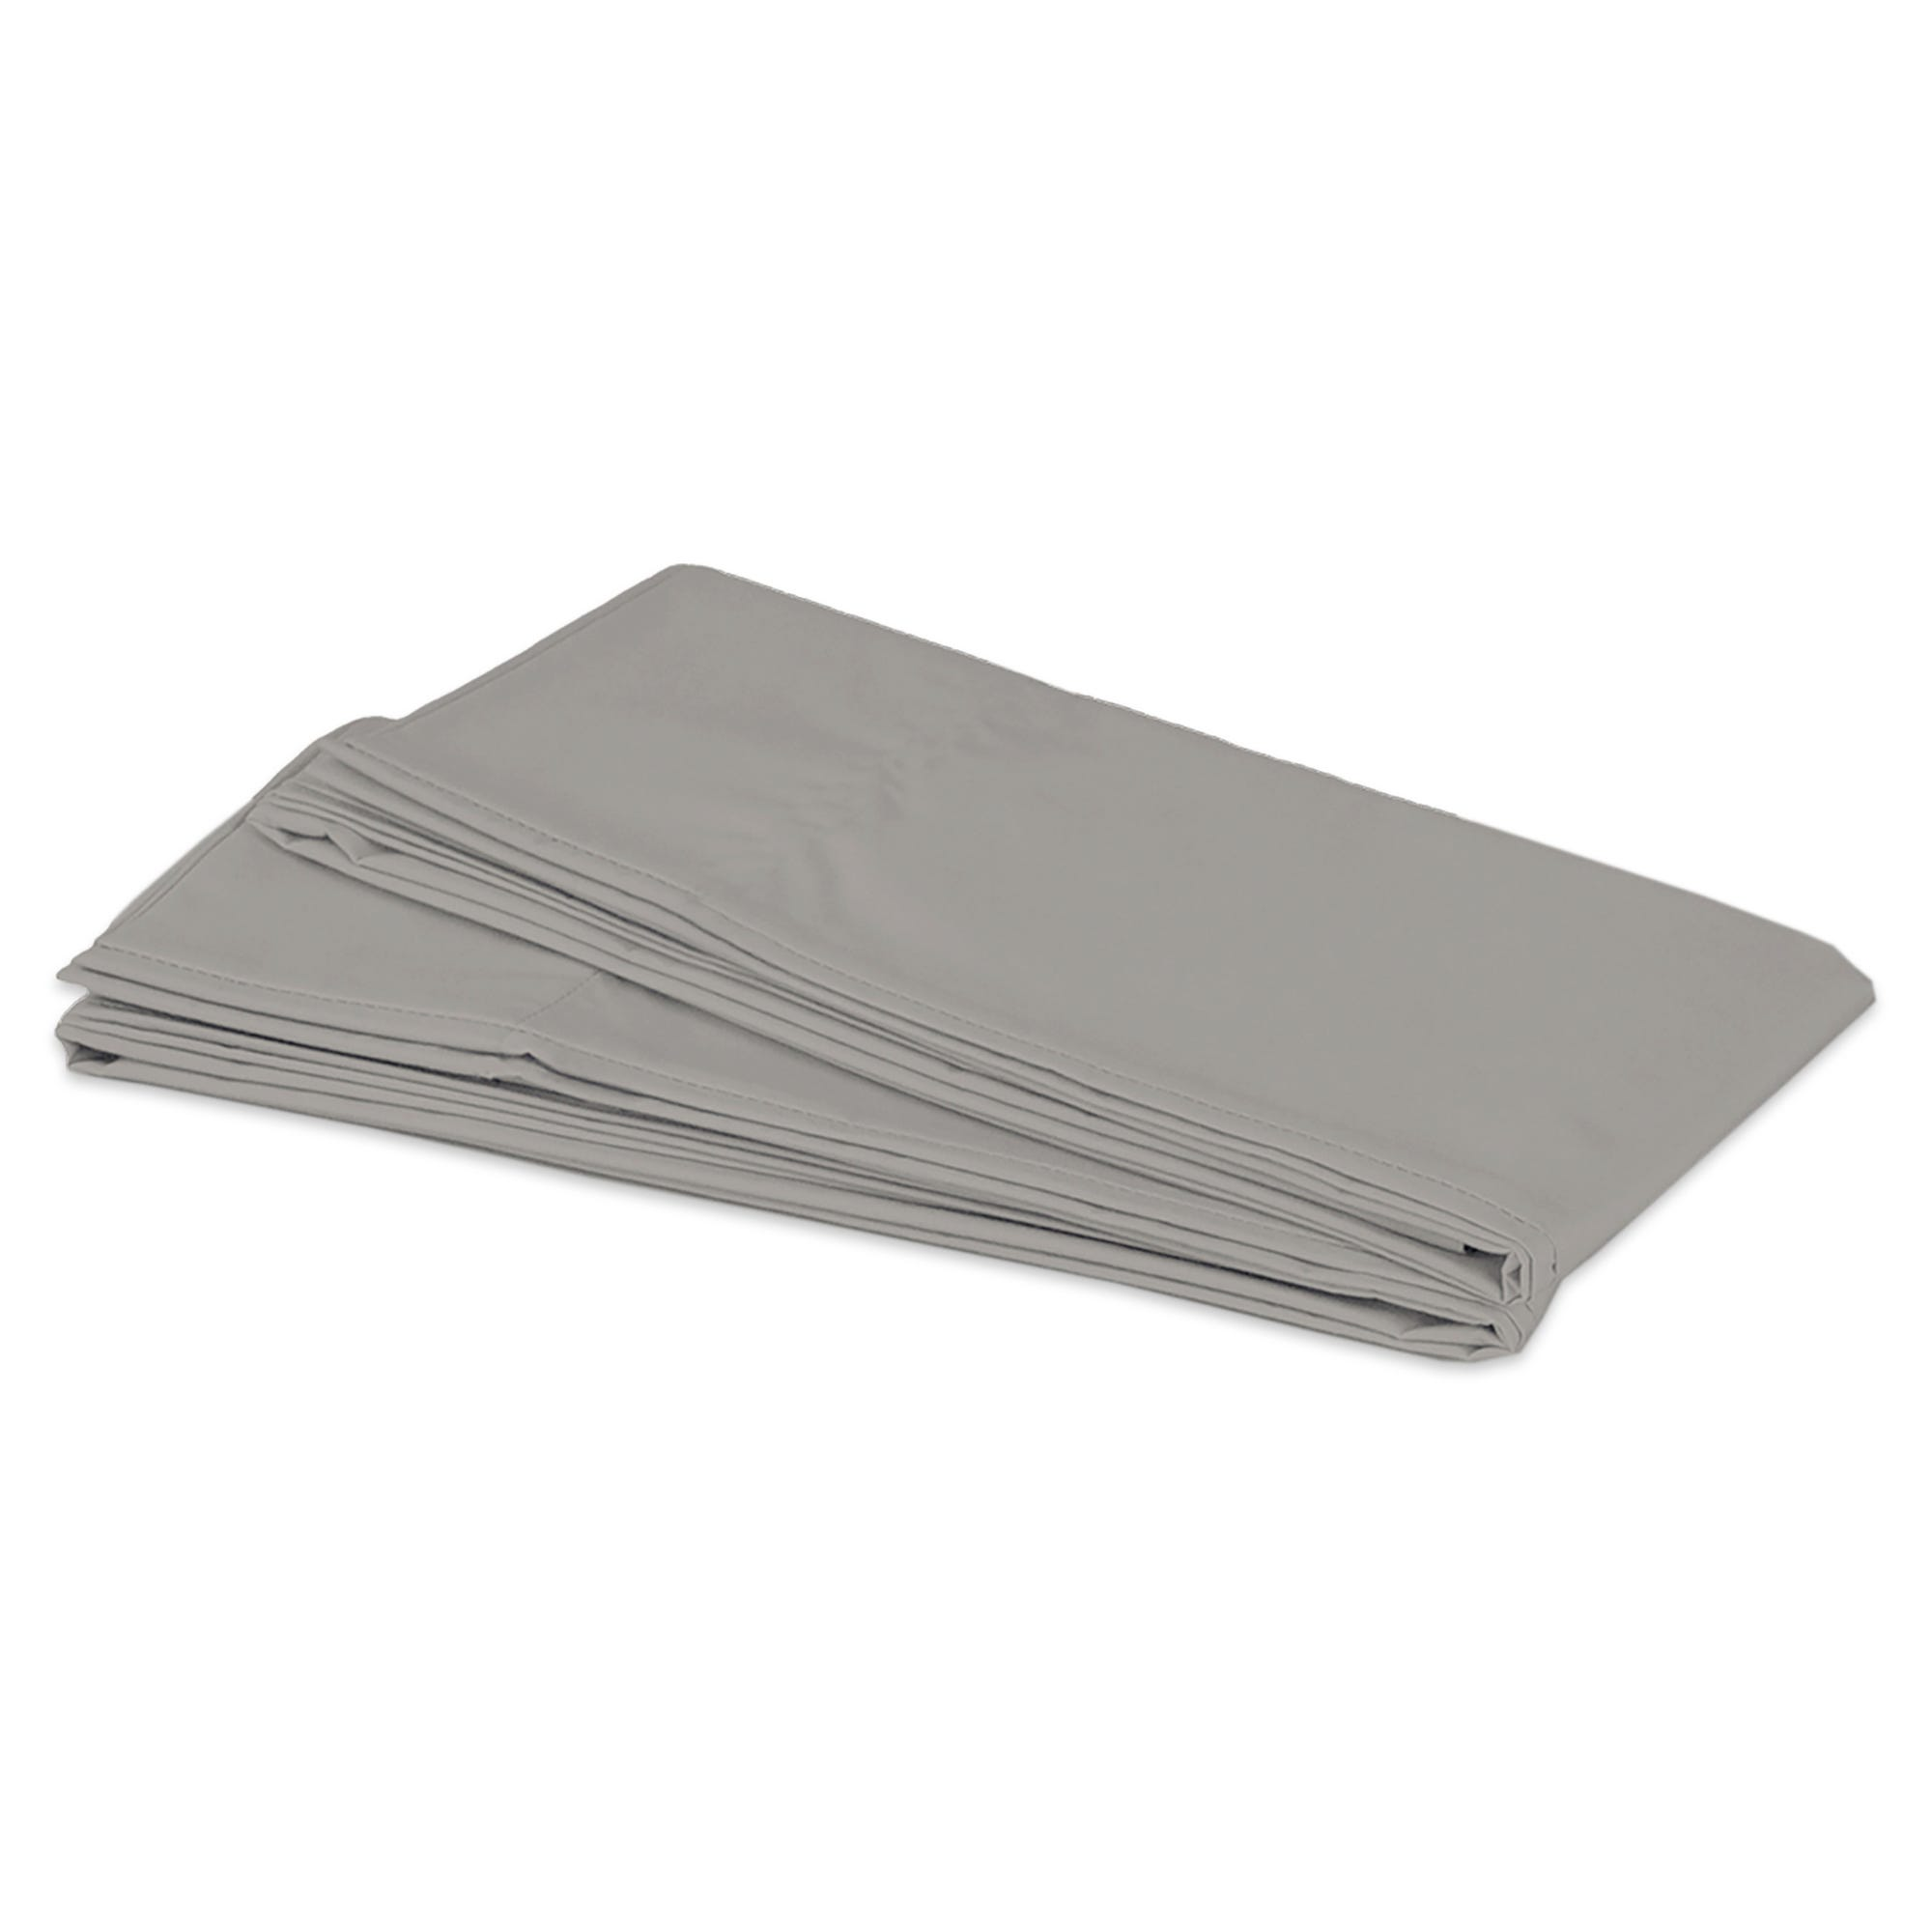 Fundas king de microfibra para almohadas Spring Air® color gris claro, Set de 2 piezas